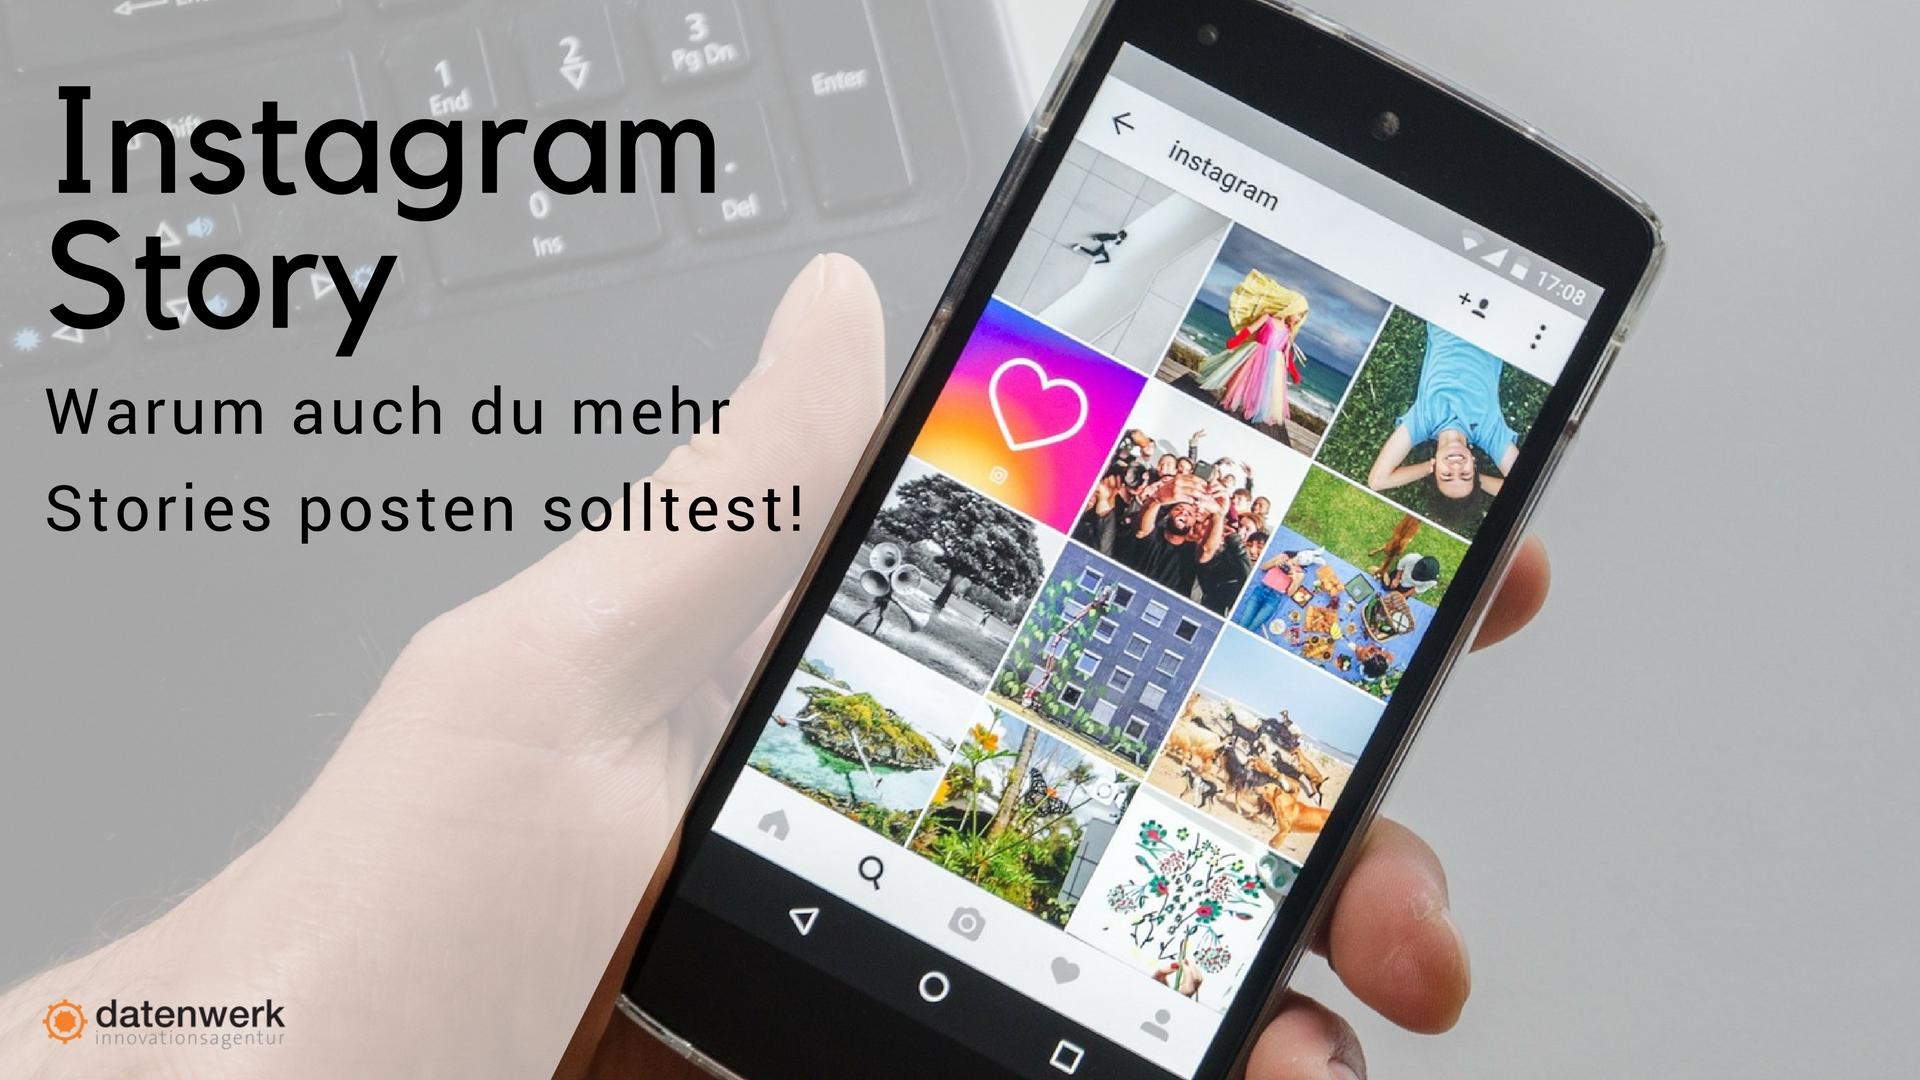 Headerbild Instagram Story